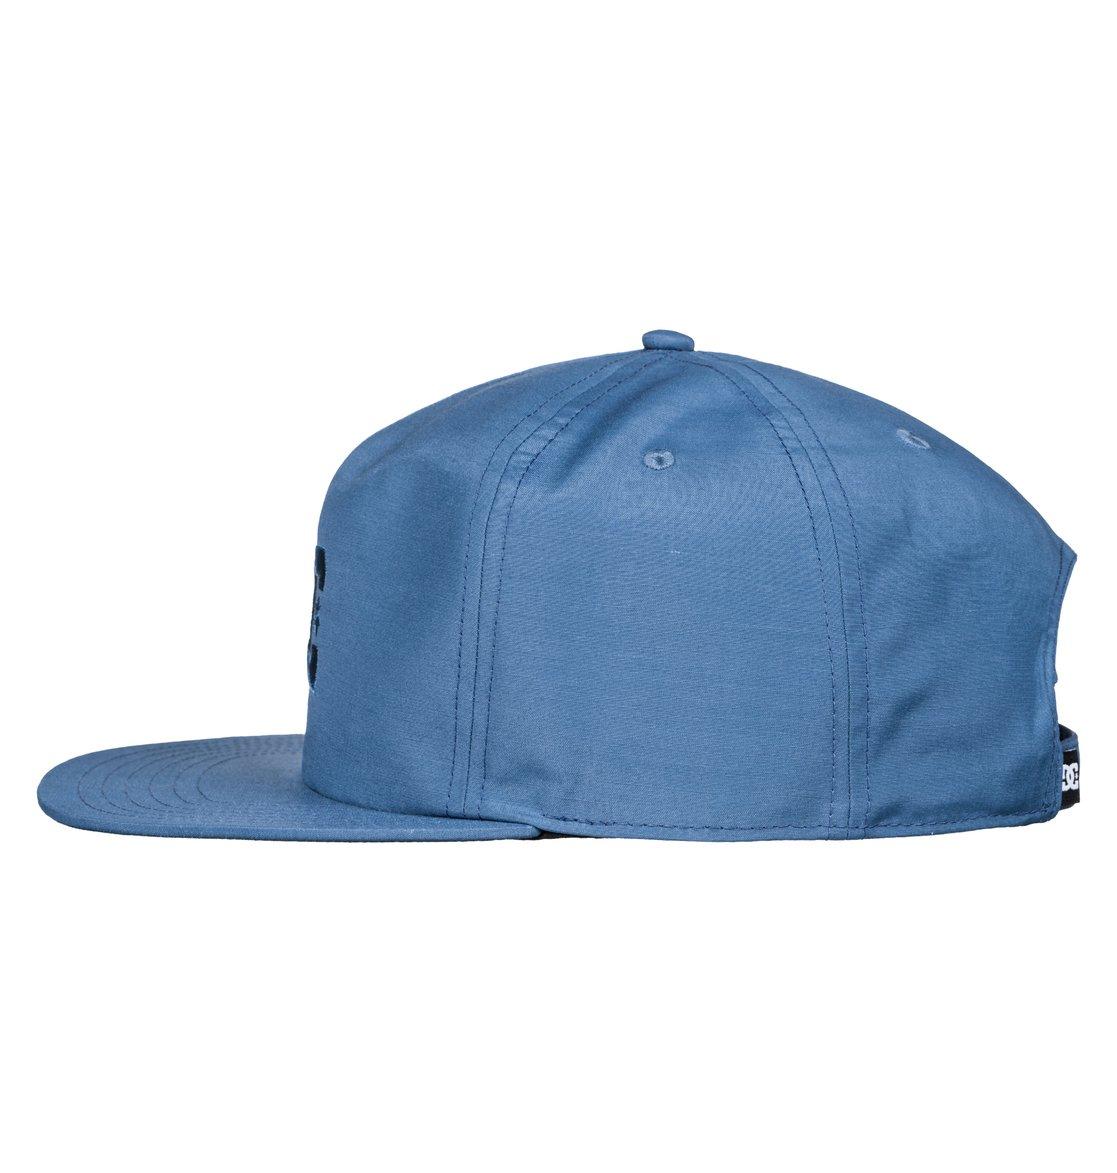 1 DC BONE FLOORA IMP Azul BR78802683 DC Shoes 12199288623b7